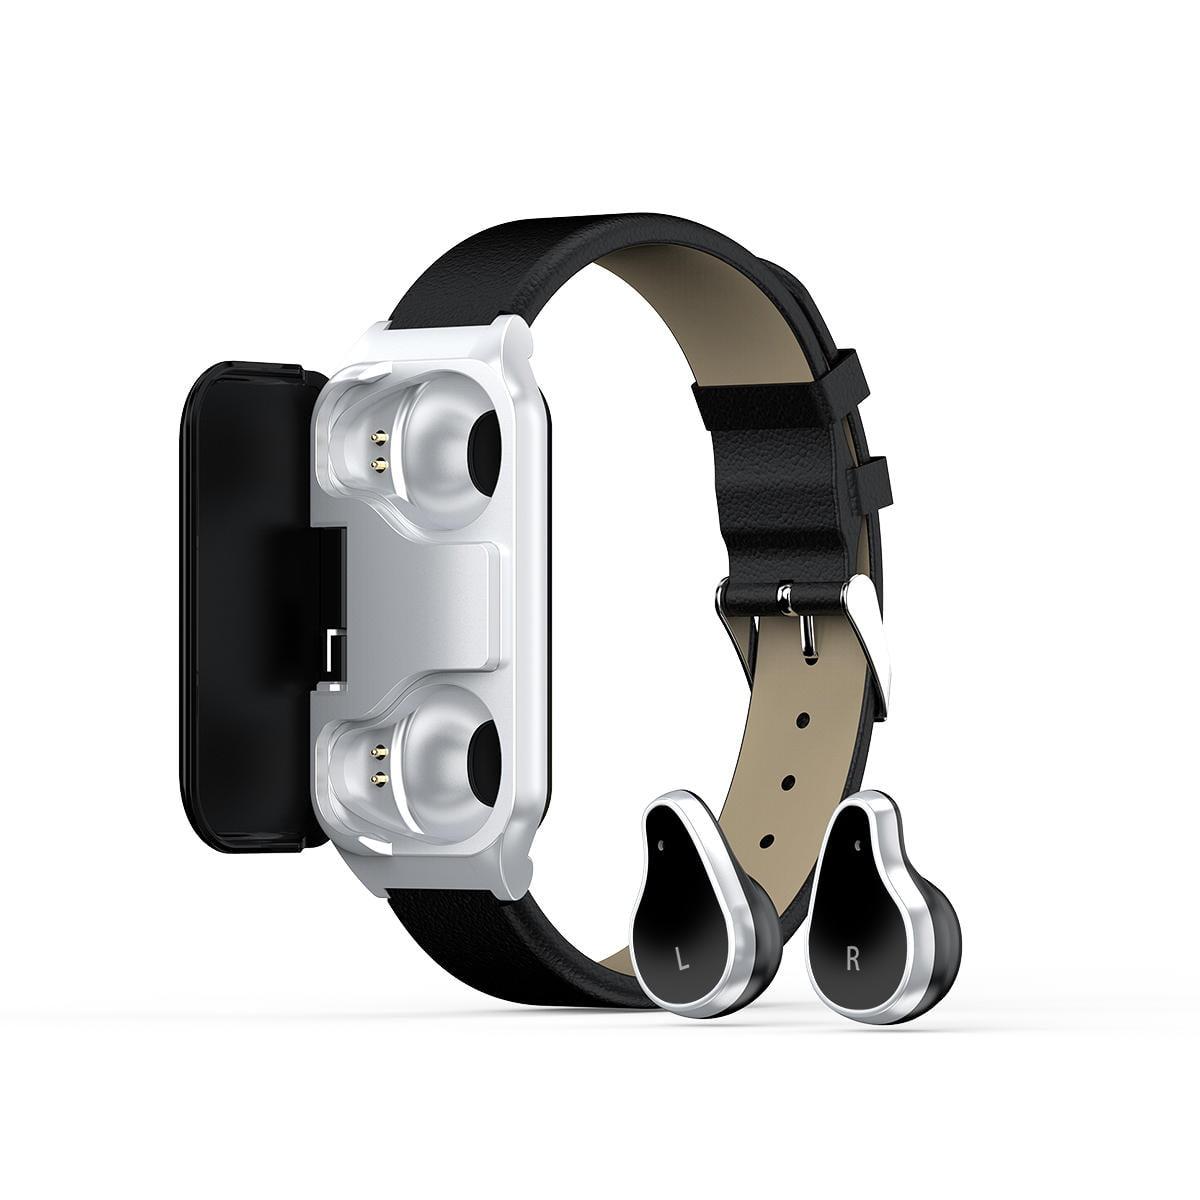 Bakeey smartwatch L818 smart watch bt5.0 intelligent noise reduction wireless earphone wristband (23)